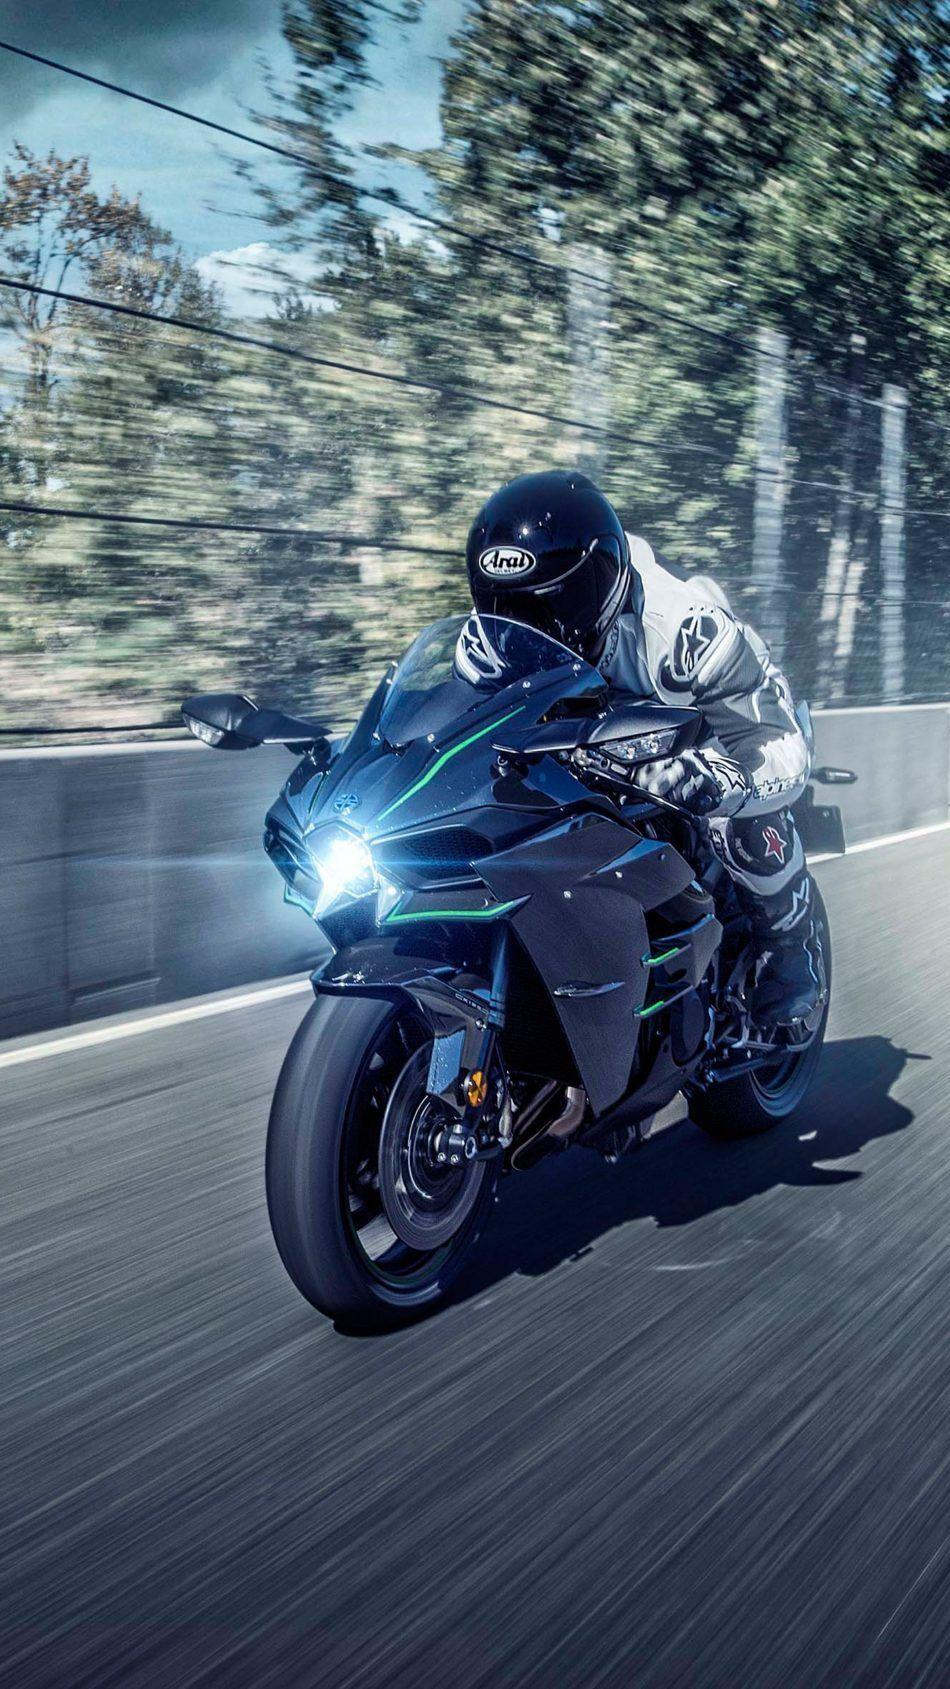 Wallpaper Motocross 4k Celular In 2021 Kawasaki Ninja Ninja Bike Kawasaki Bikes